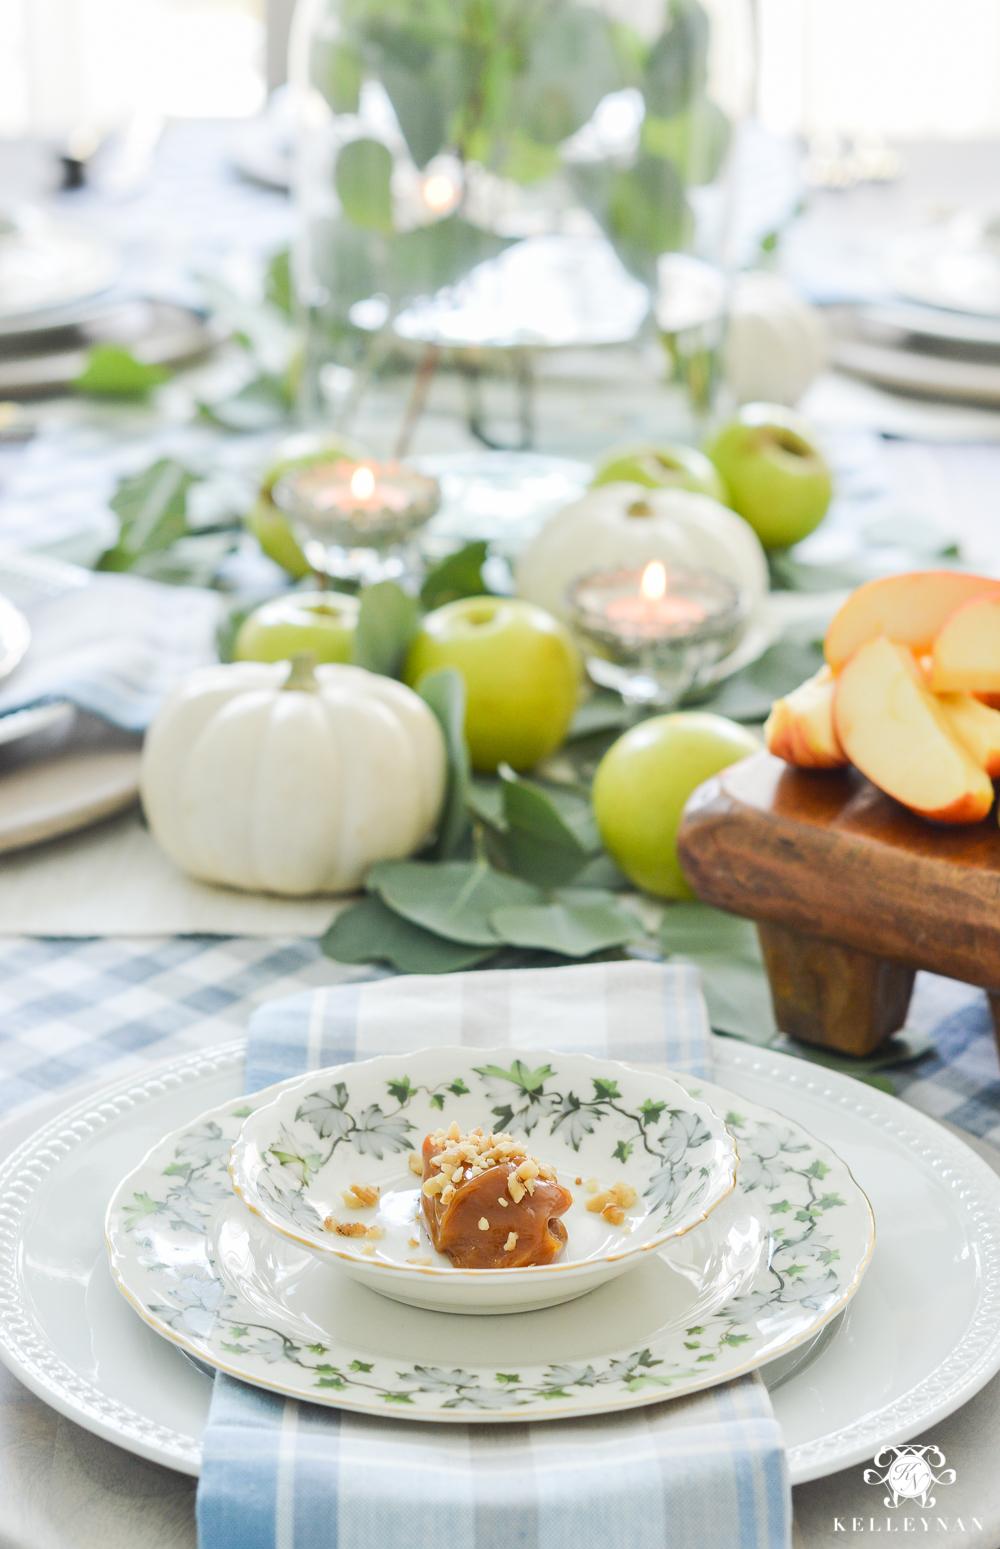 Fall Caramel Apple Table Place Setting Ideas- autumn place setting ideas & Easy Fall Table Idea - Caramel Apple Place Settings - Kelley Nan